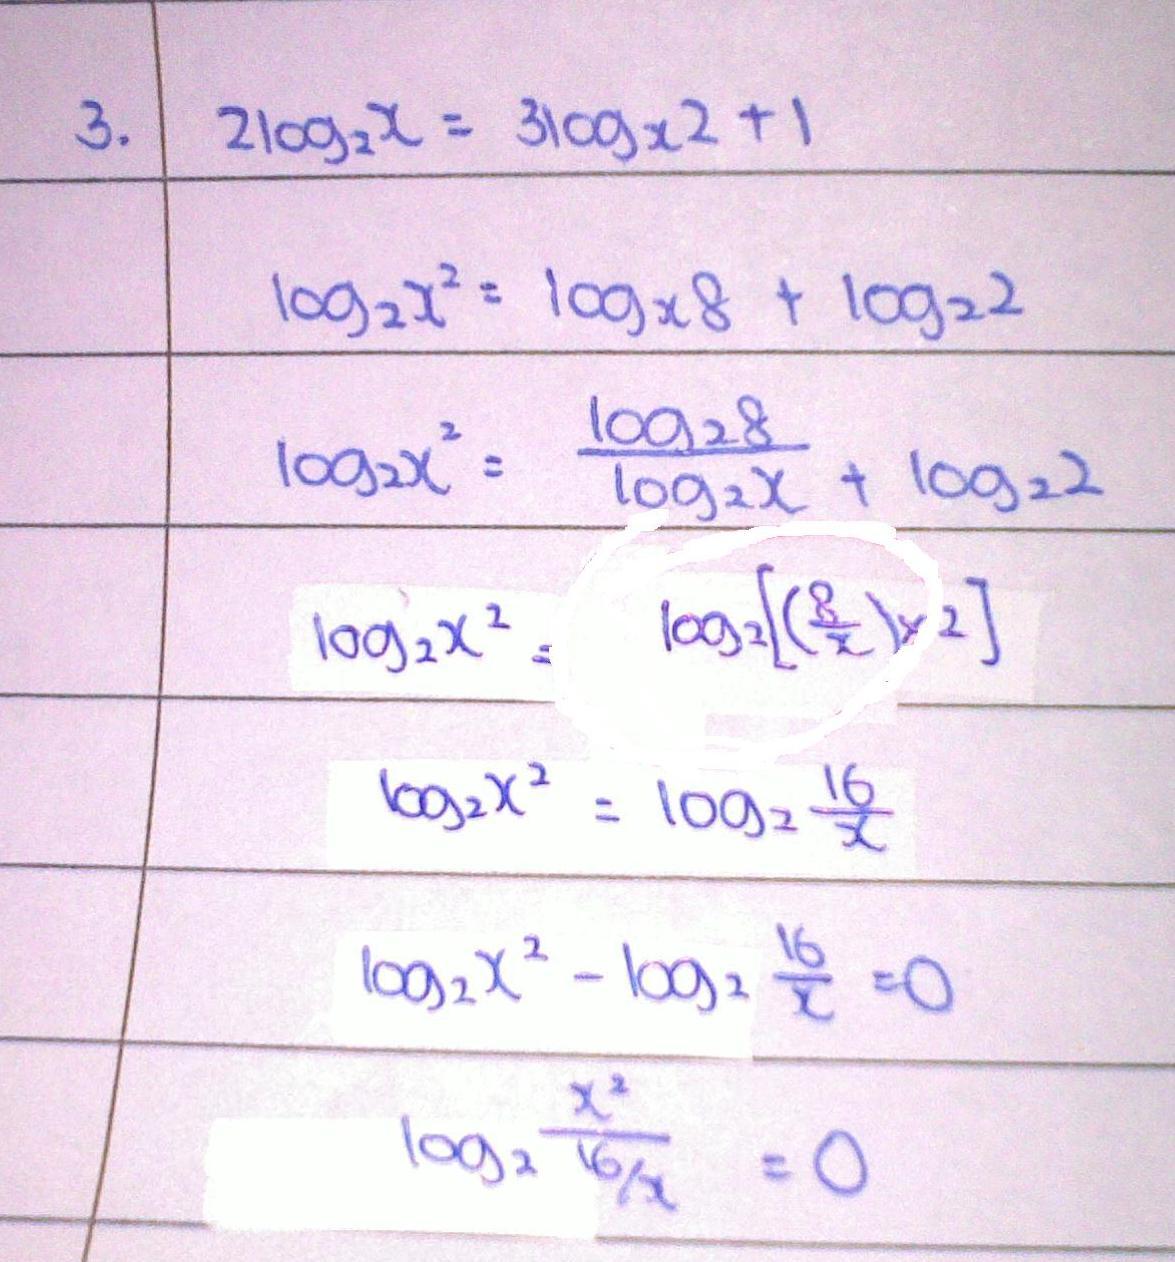 Logarithm-error